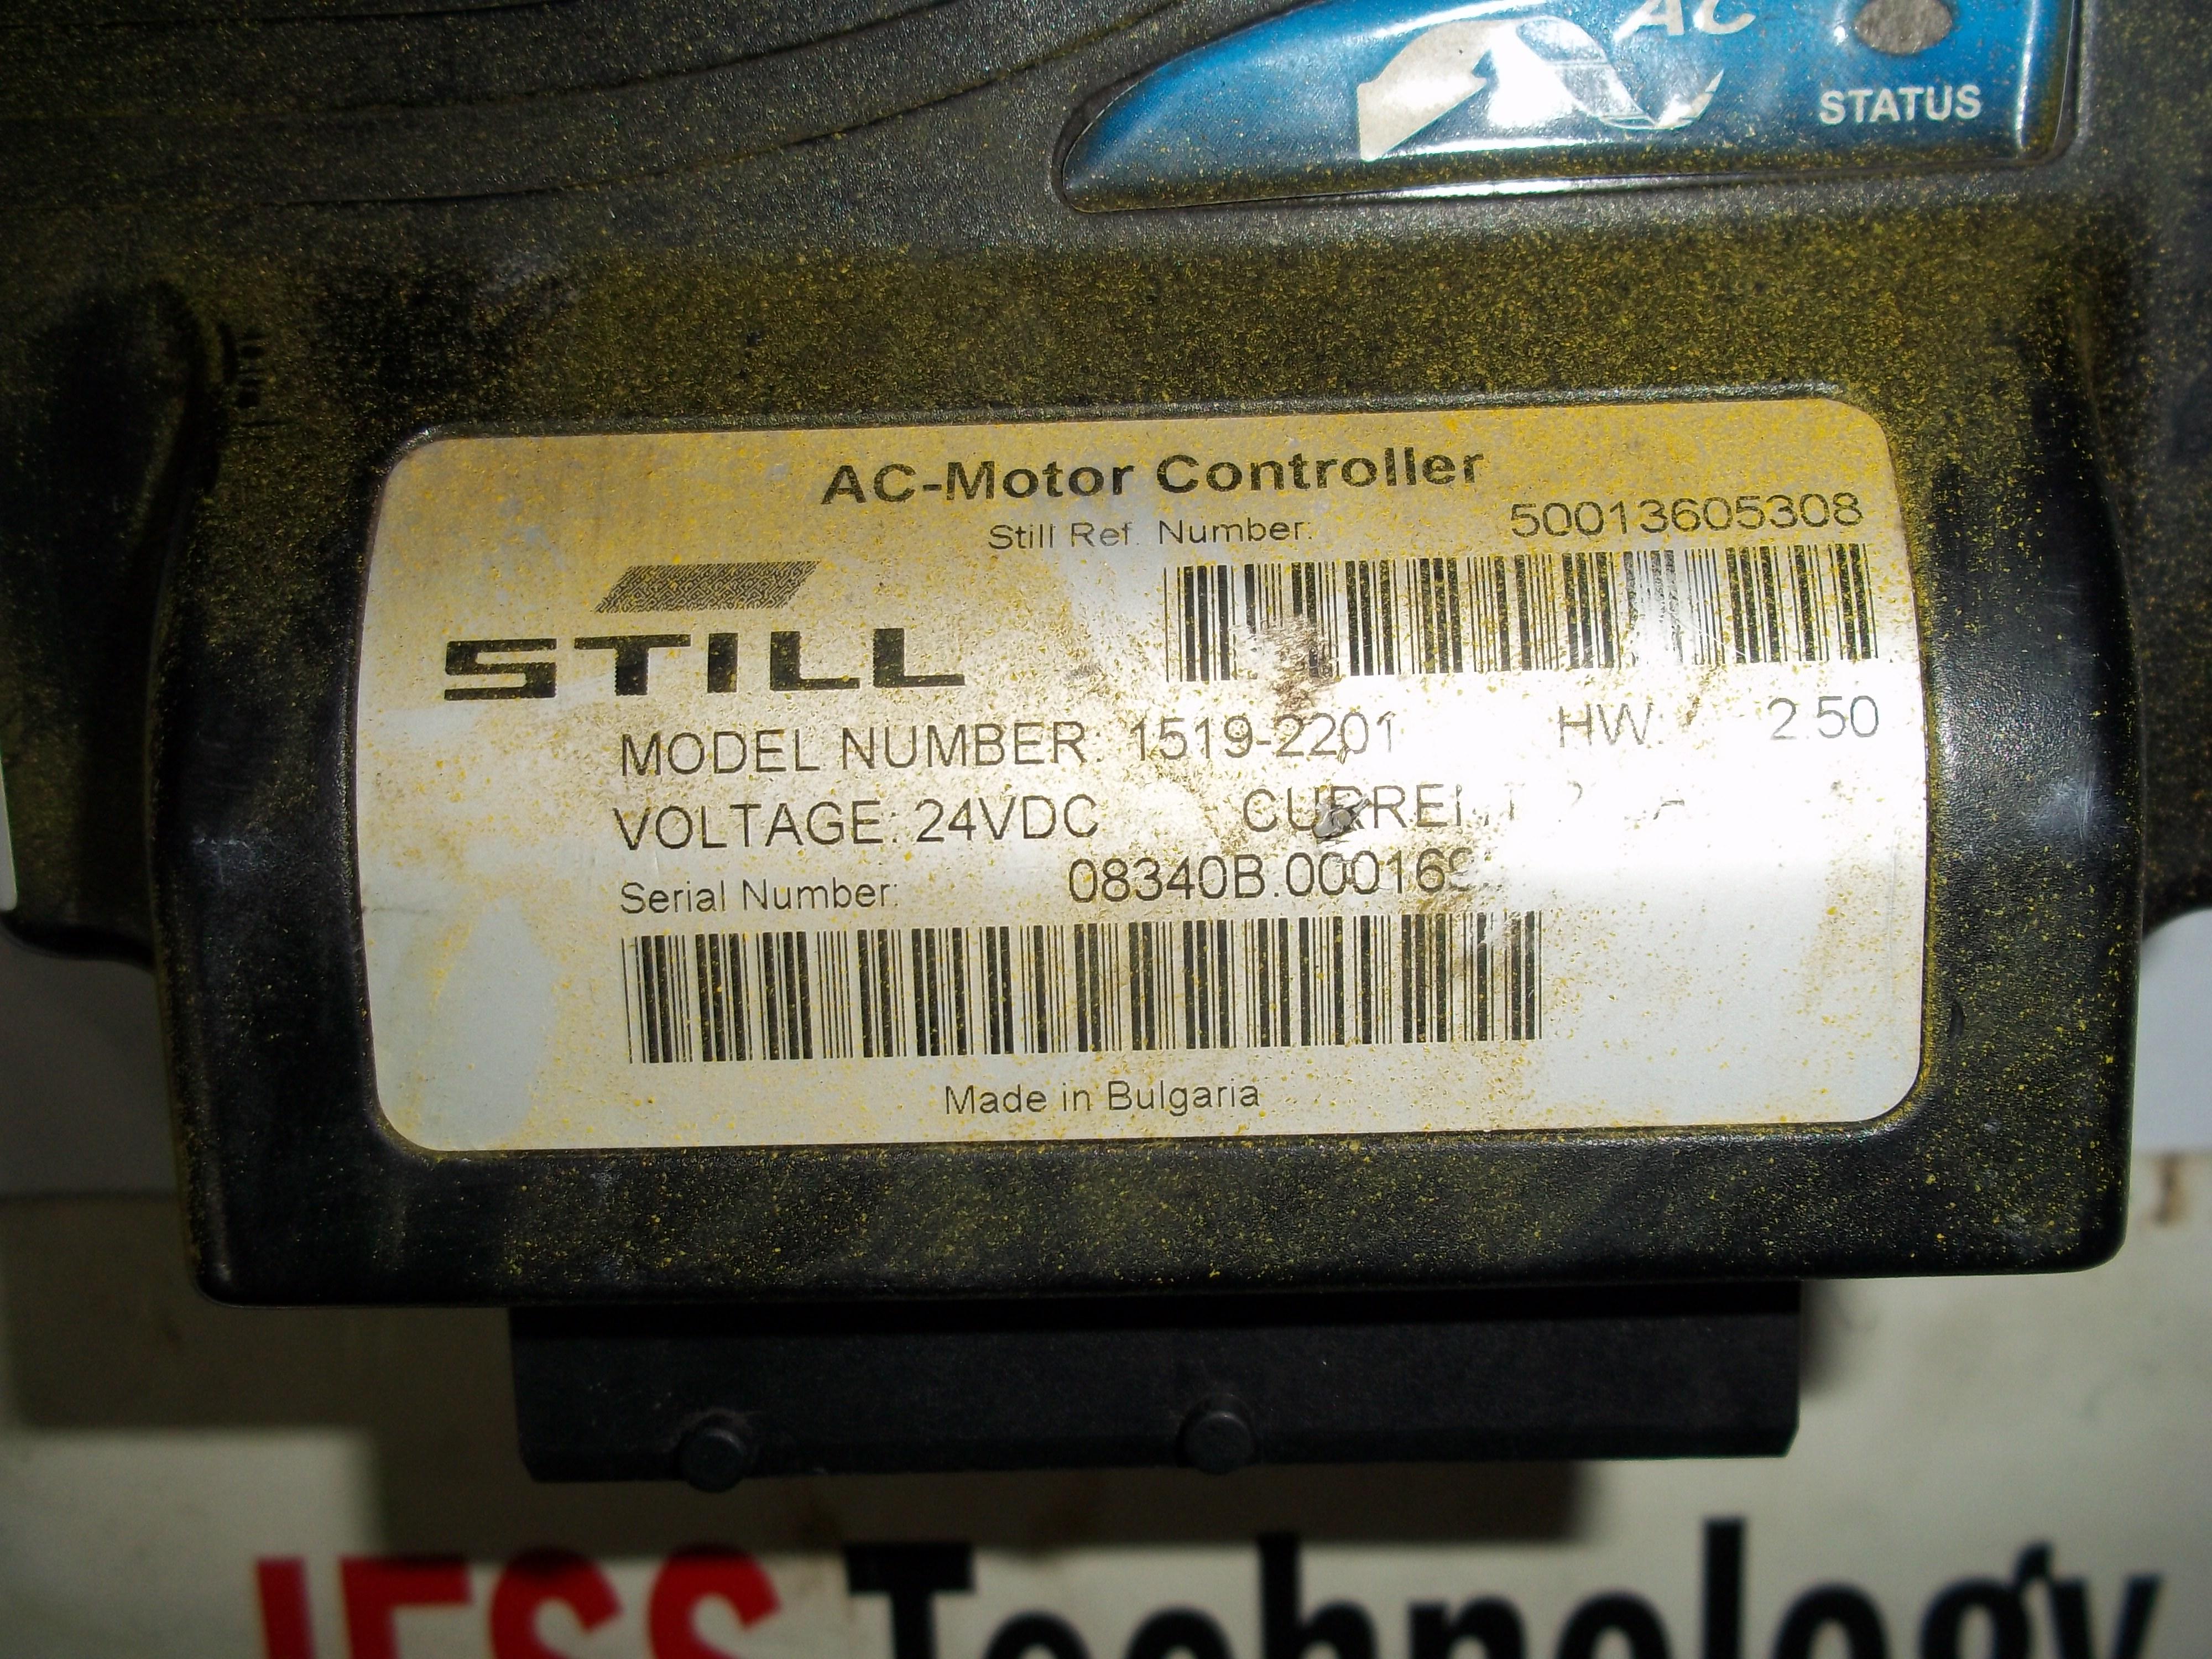 Repair 08340B.000169 STILL STILL AC MOTOR CONTROLLER (1519-2201) (A3131) in Malaysia, Singapore, Thailand, Indonesia